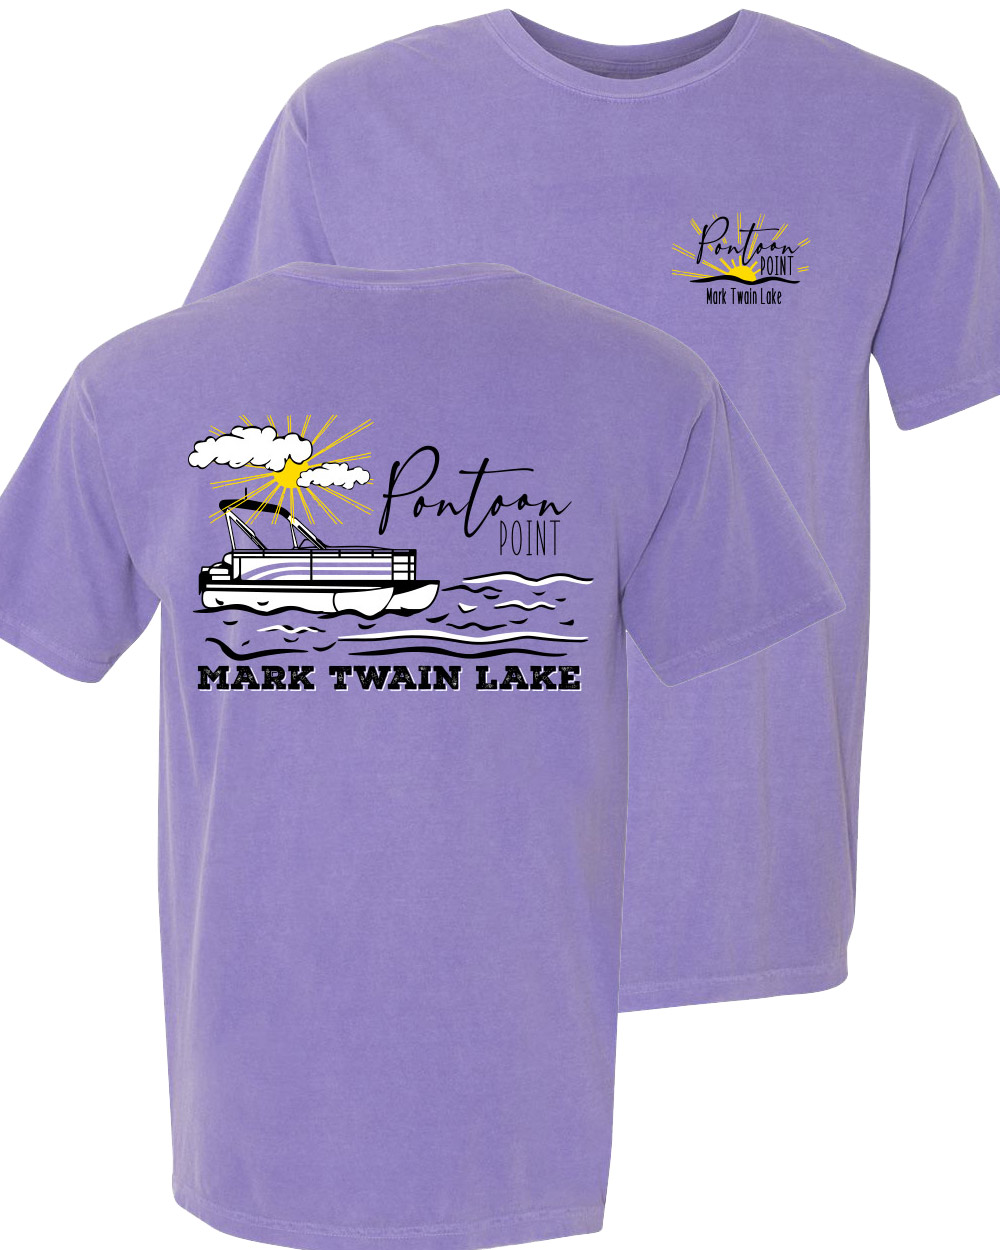 Pontoon Point violet